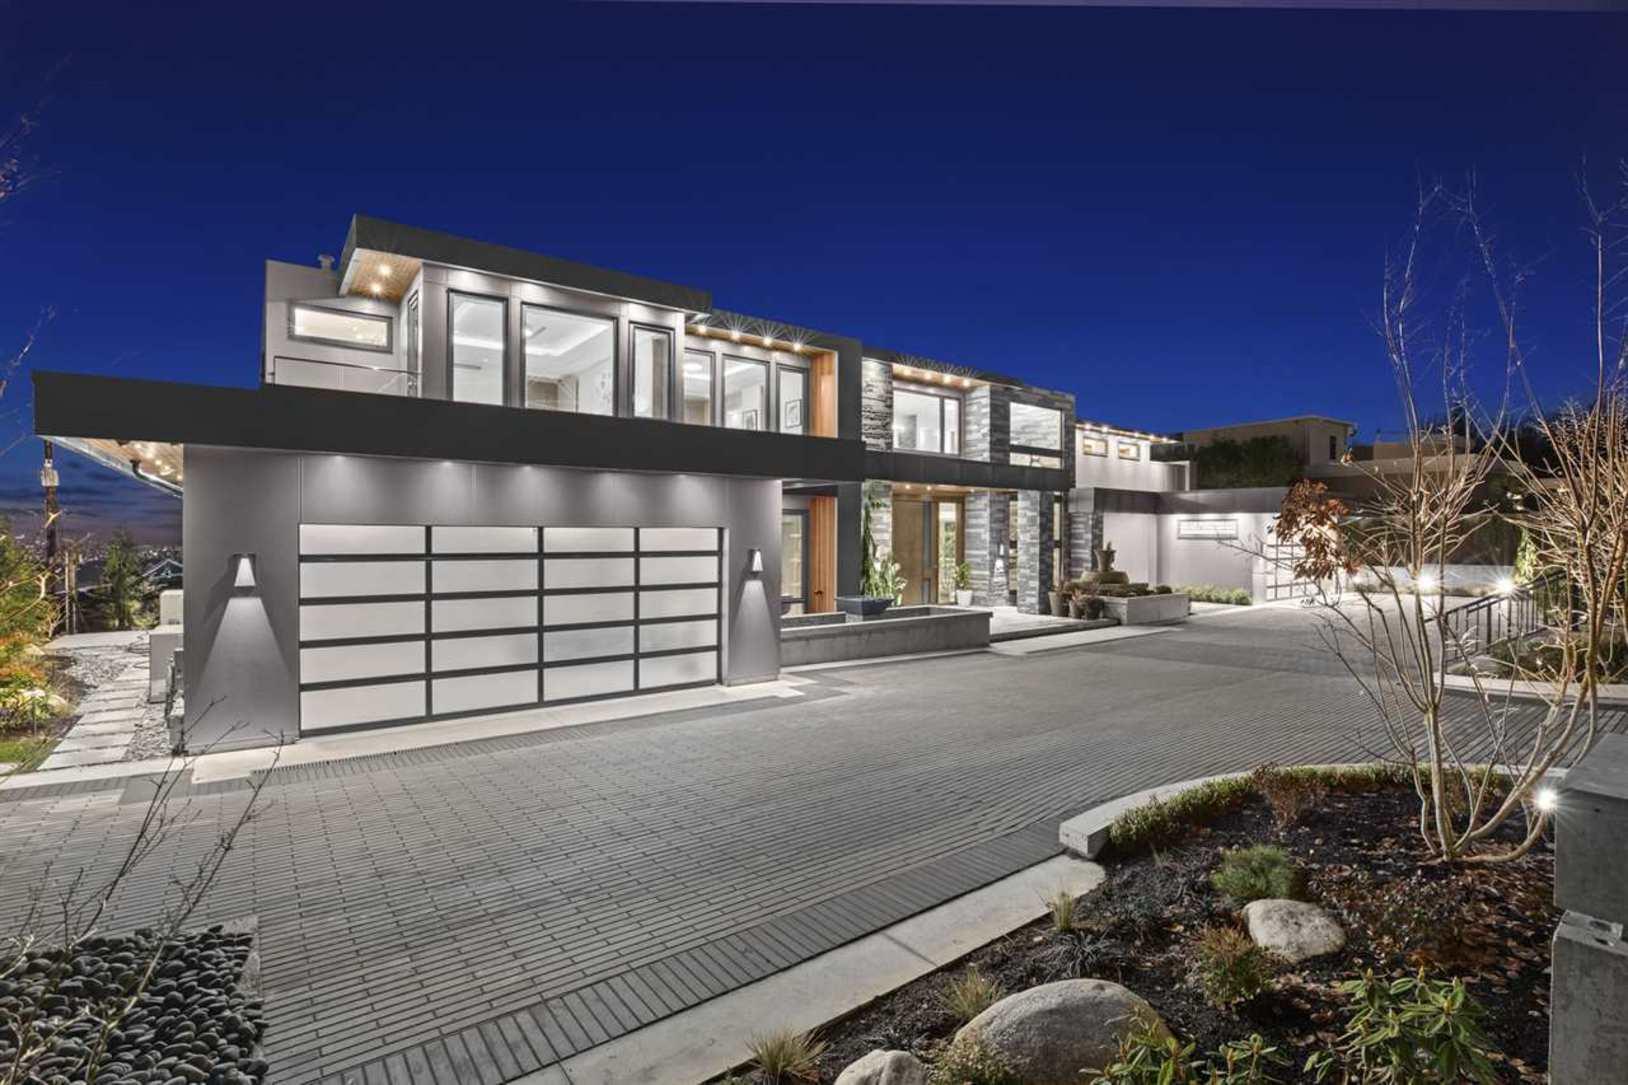 830-king-georges-way-british-properties-west-vancouver-02 at 830 King Georges Way, British Properties, West Vancouver